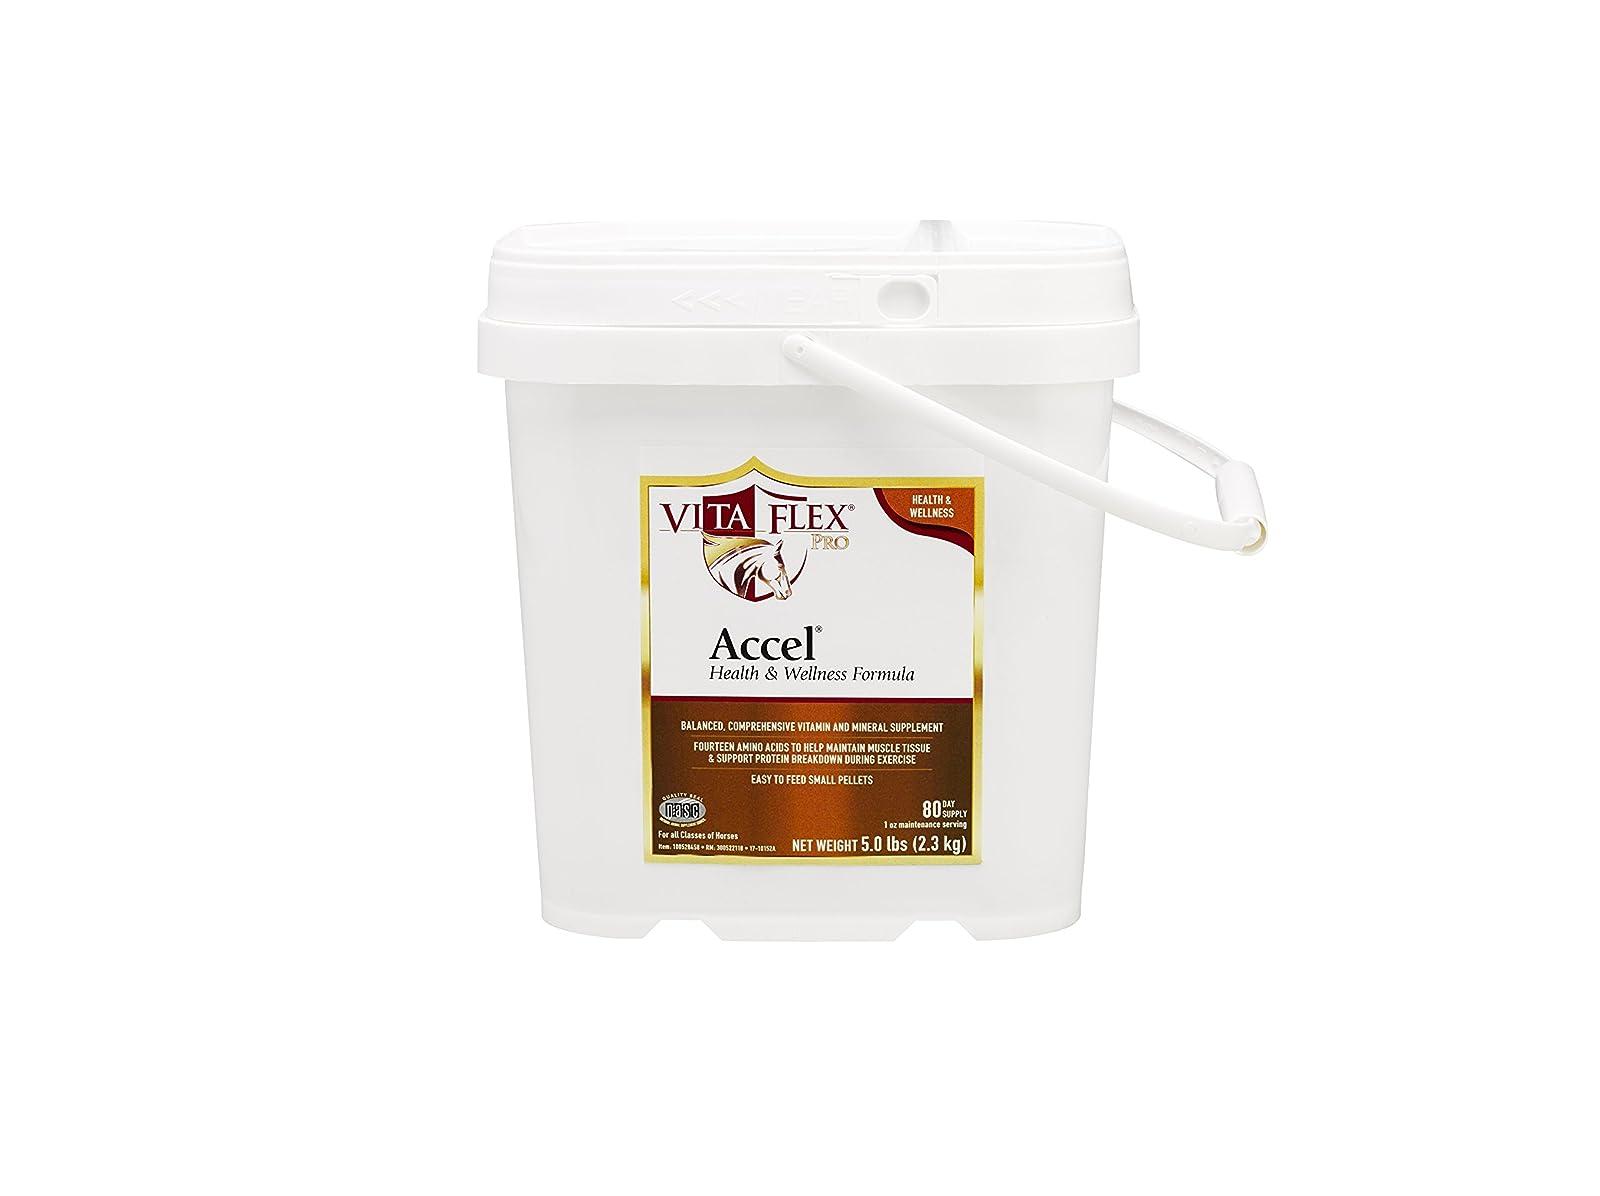 Vita Flex Pro Accel Health & Wellness Formula 100528458 - 2